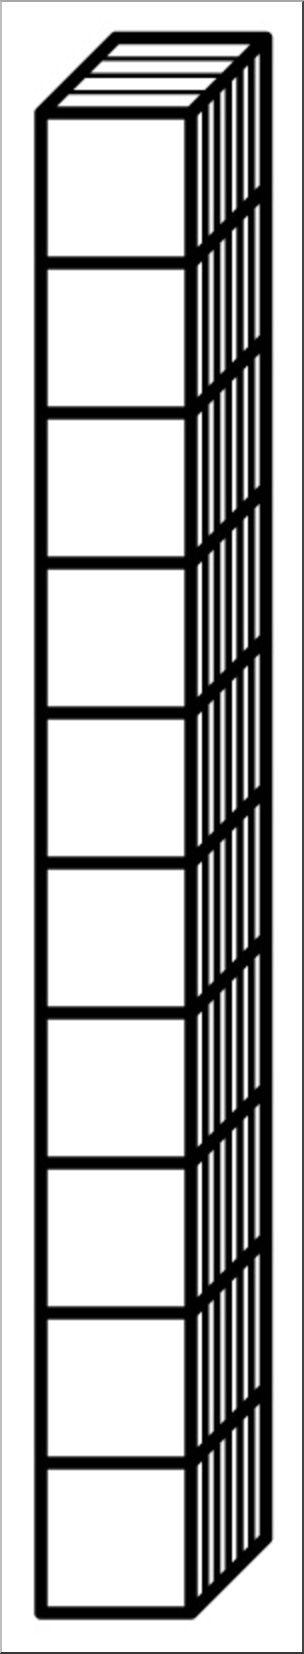 math worksheet : free base ten blocks math worksheets  educational math activities : Base Ten Math Worksheets